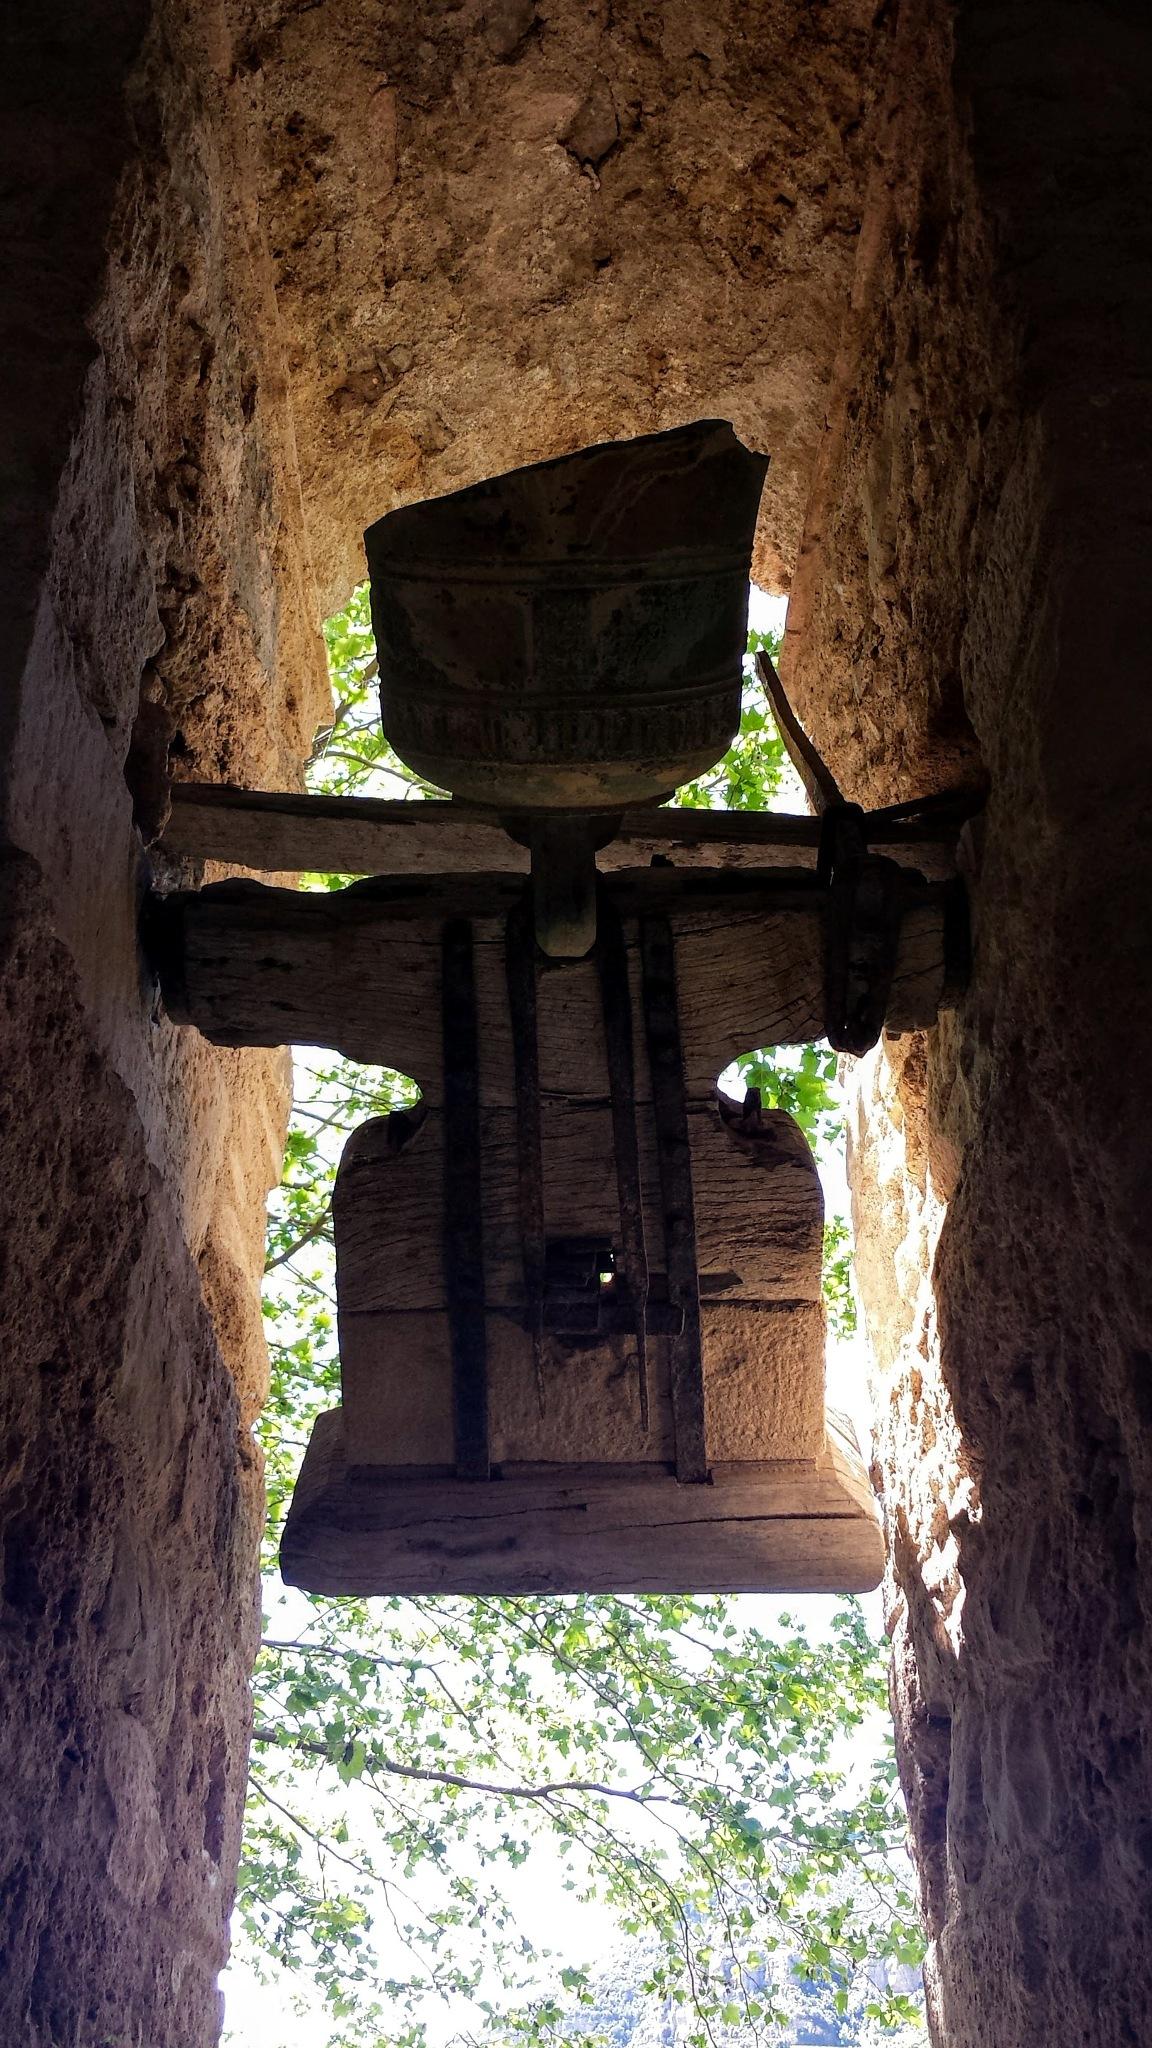 La campana rota by JMDuque